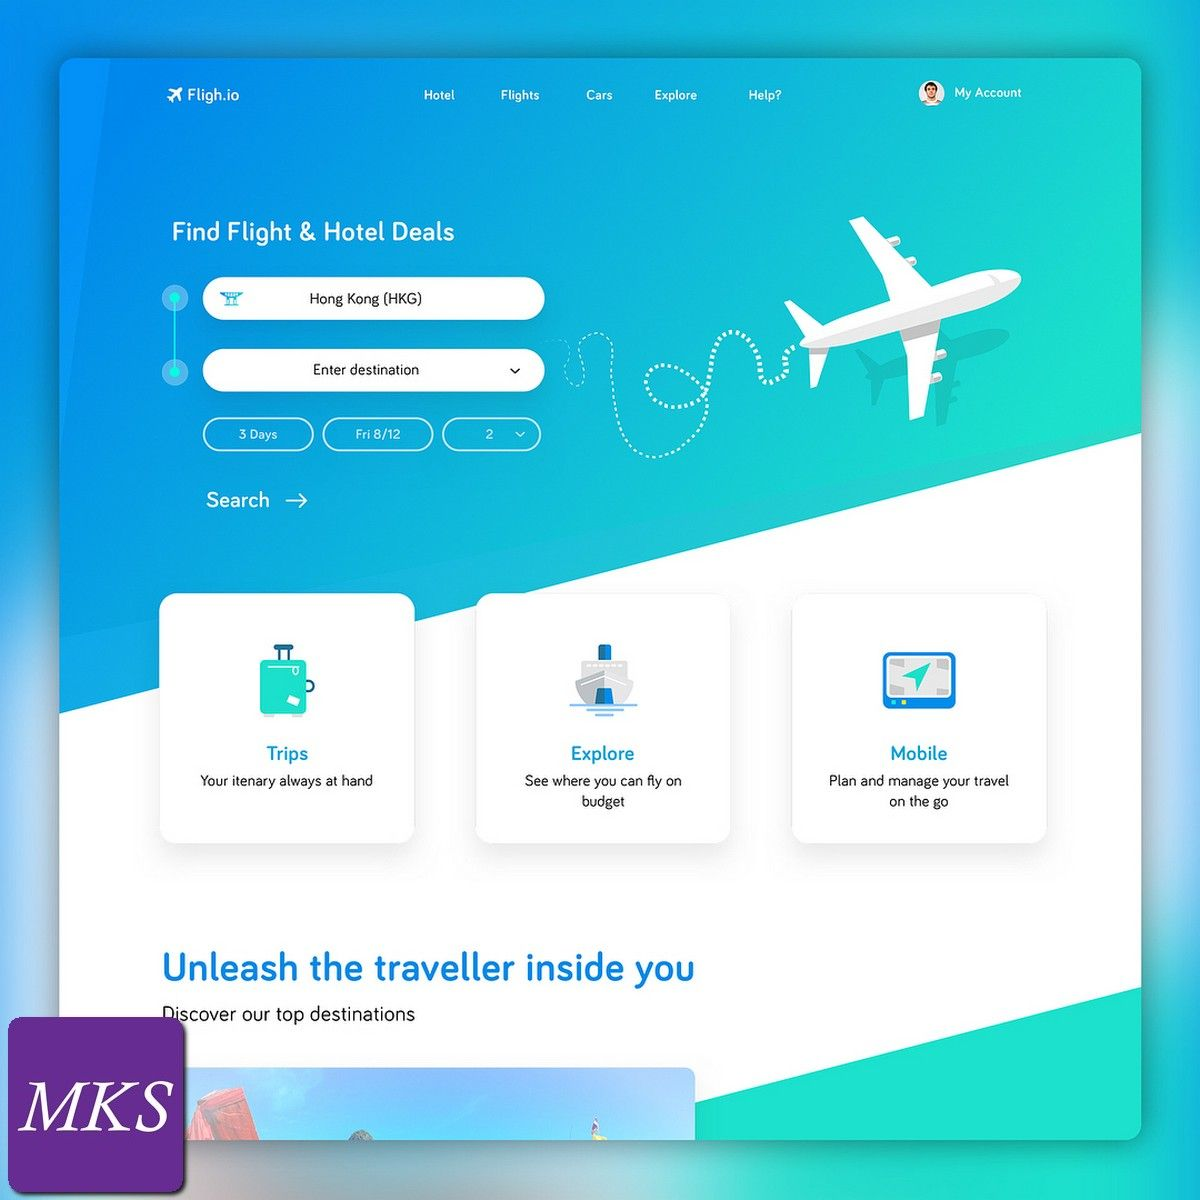 MKS Web Design #webdesign #websites #wordpressdesign #wordpress #mhk